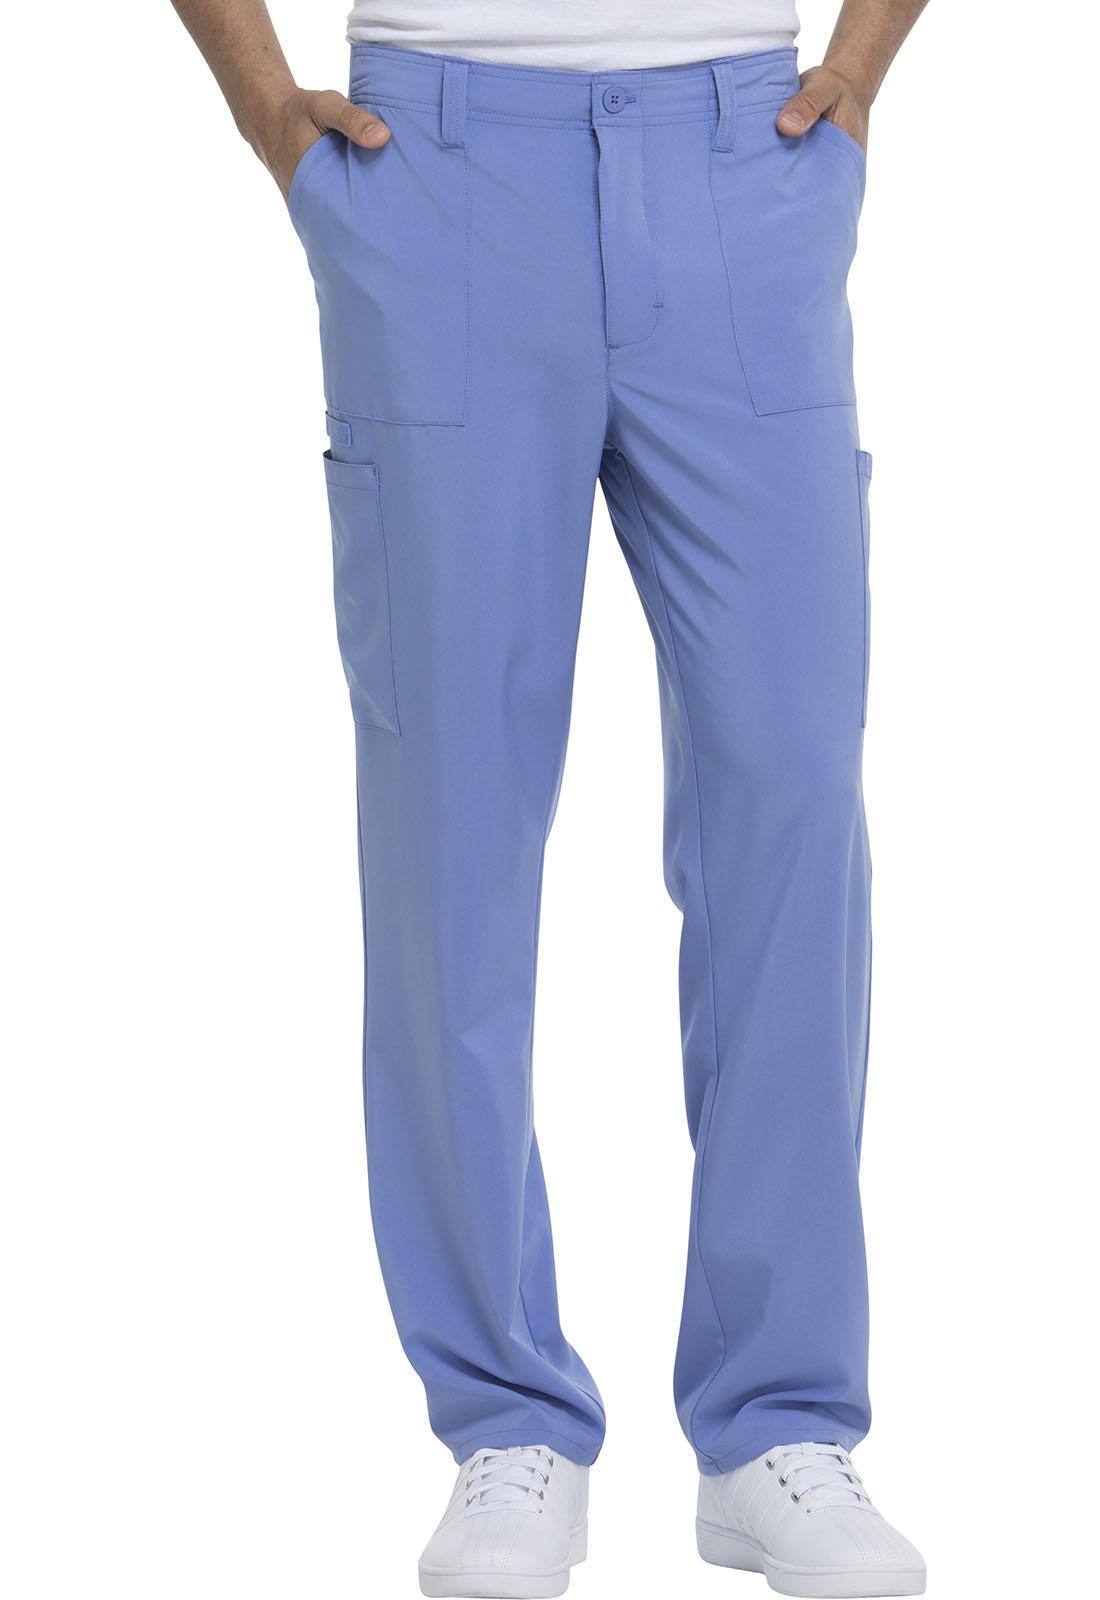 TOP:DK635 // Pant:DK015 New Dickies EDS Essentials Men/'s Scrubs Sets in Royal